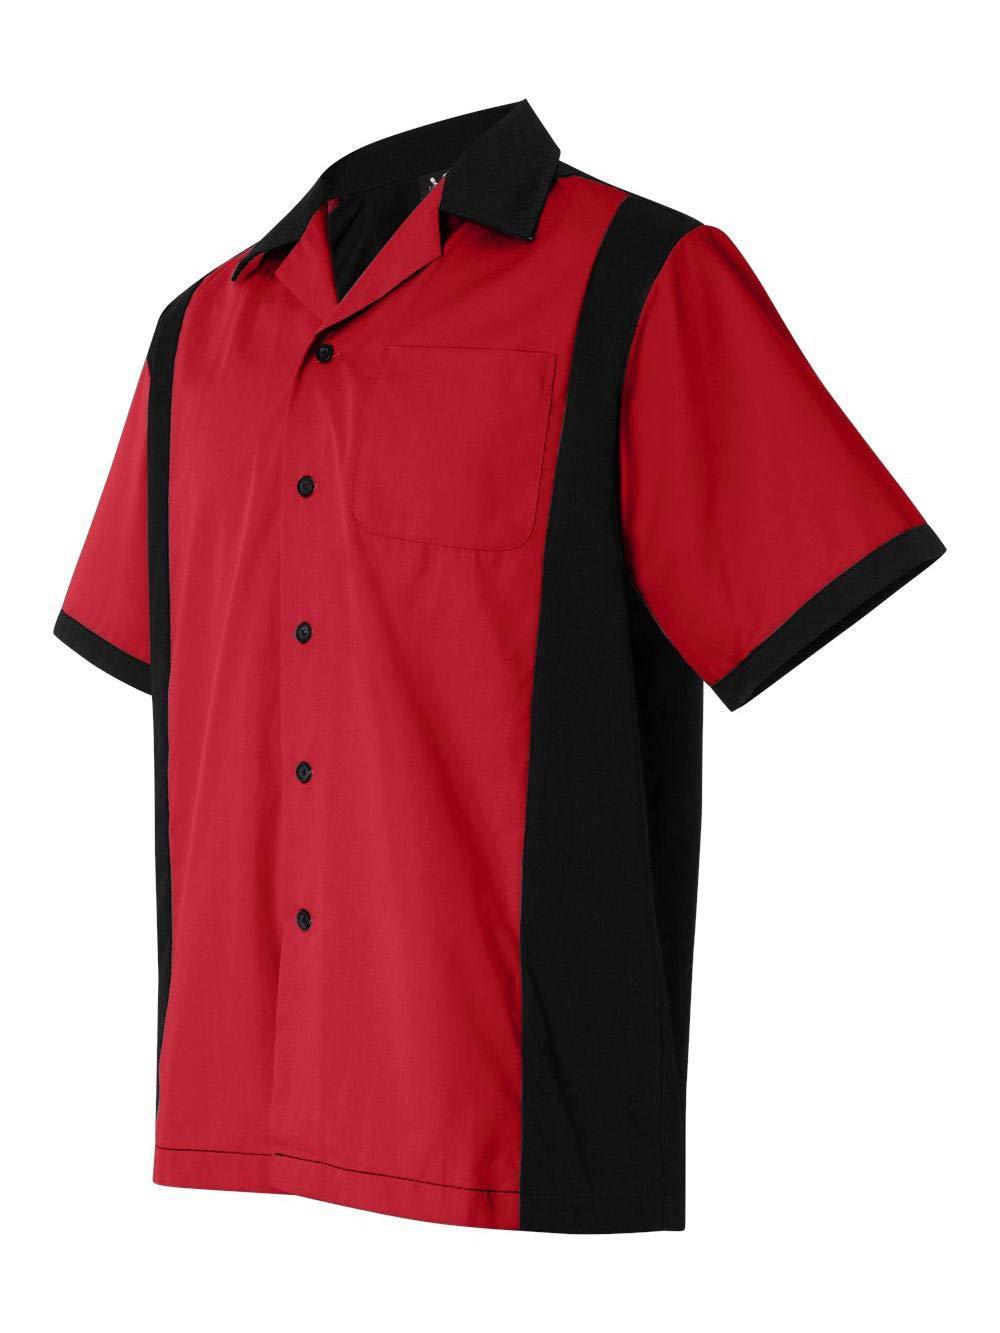 Hilton Bowling Retro Cruiser (Red_Black) (3X)